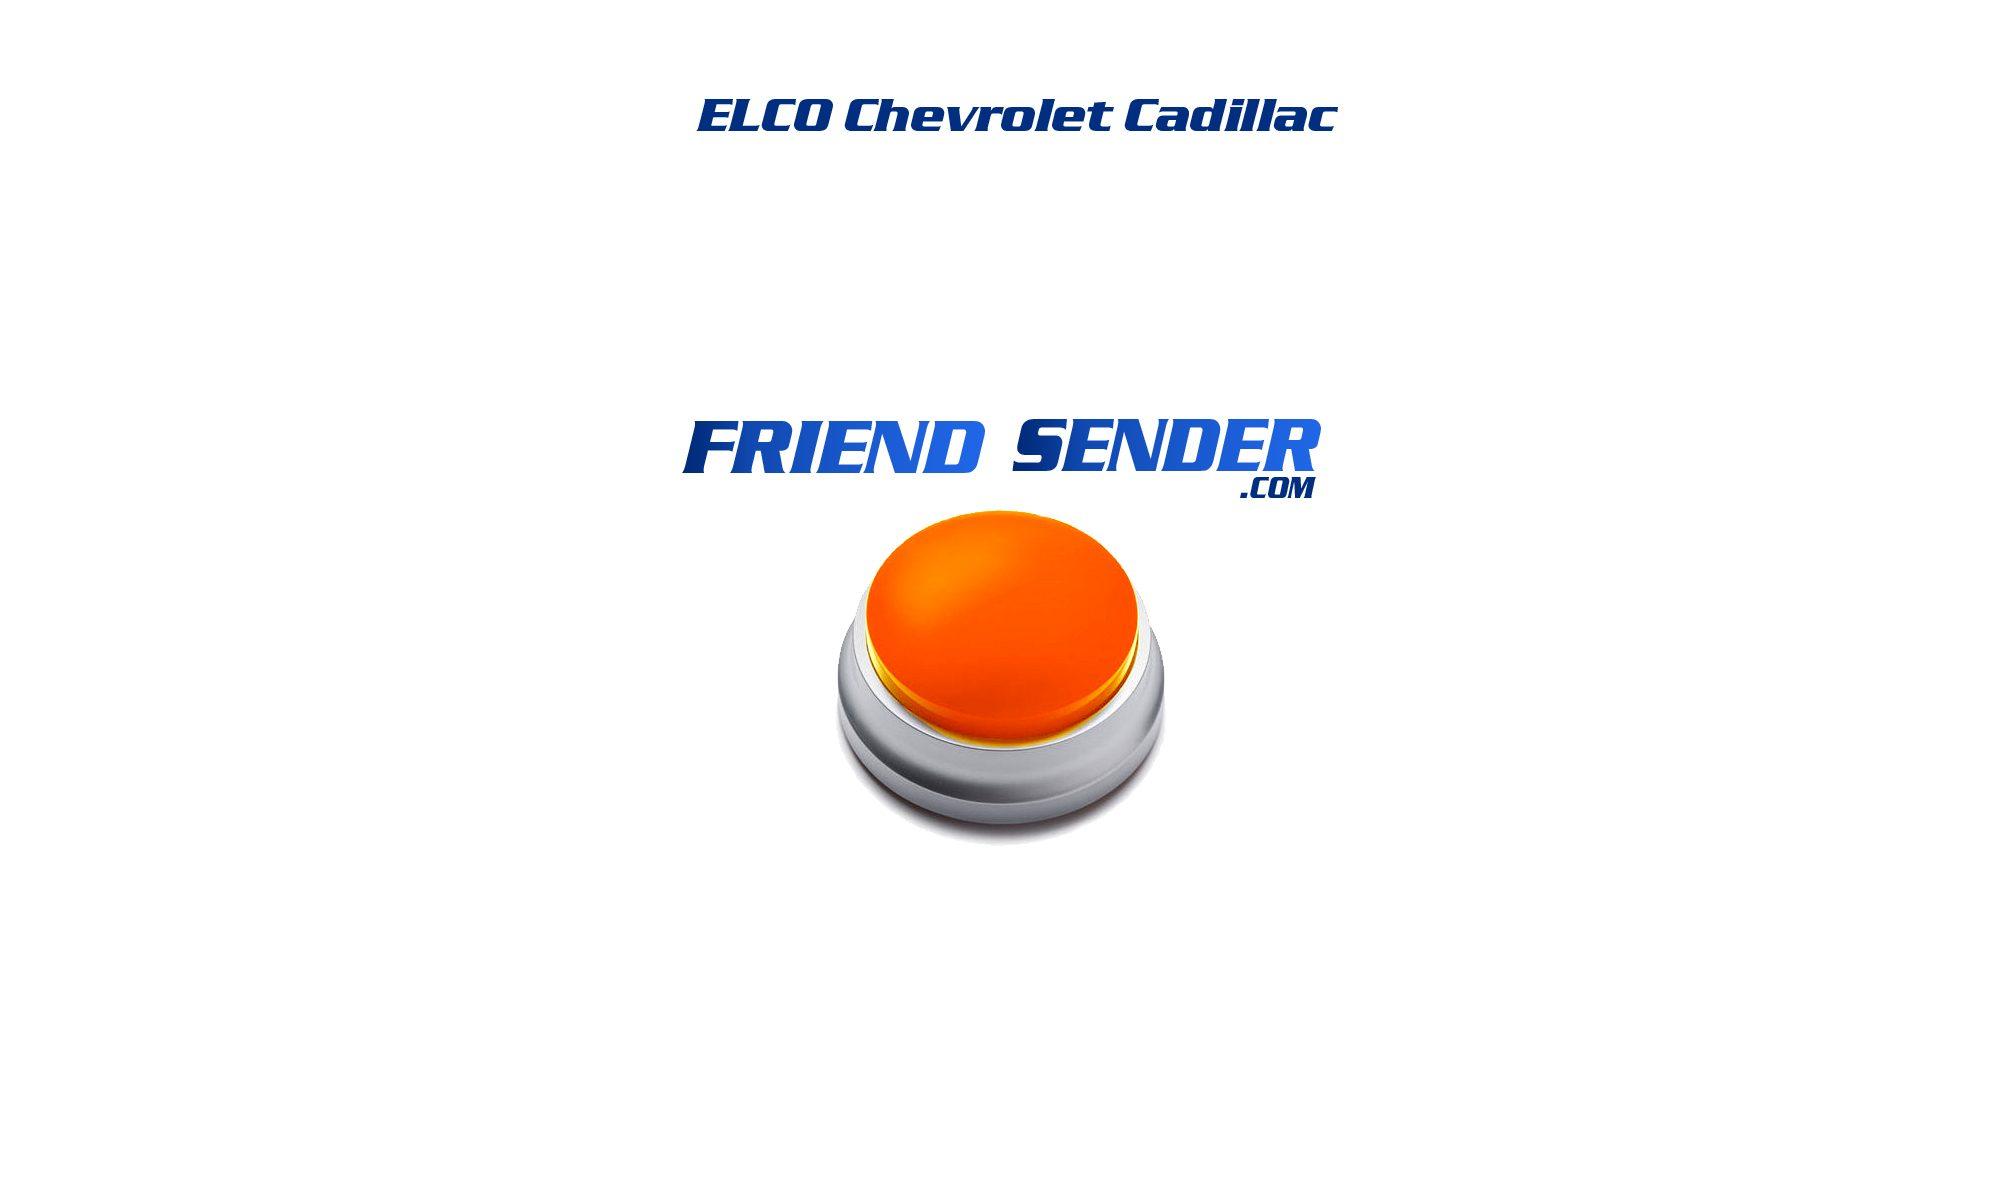 Friend Sender